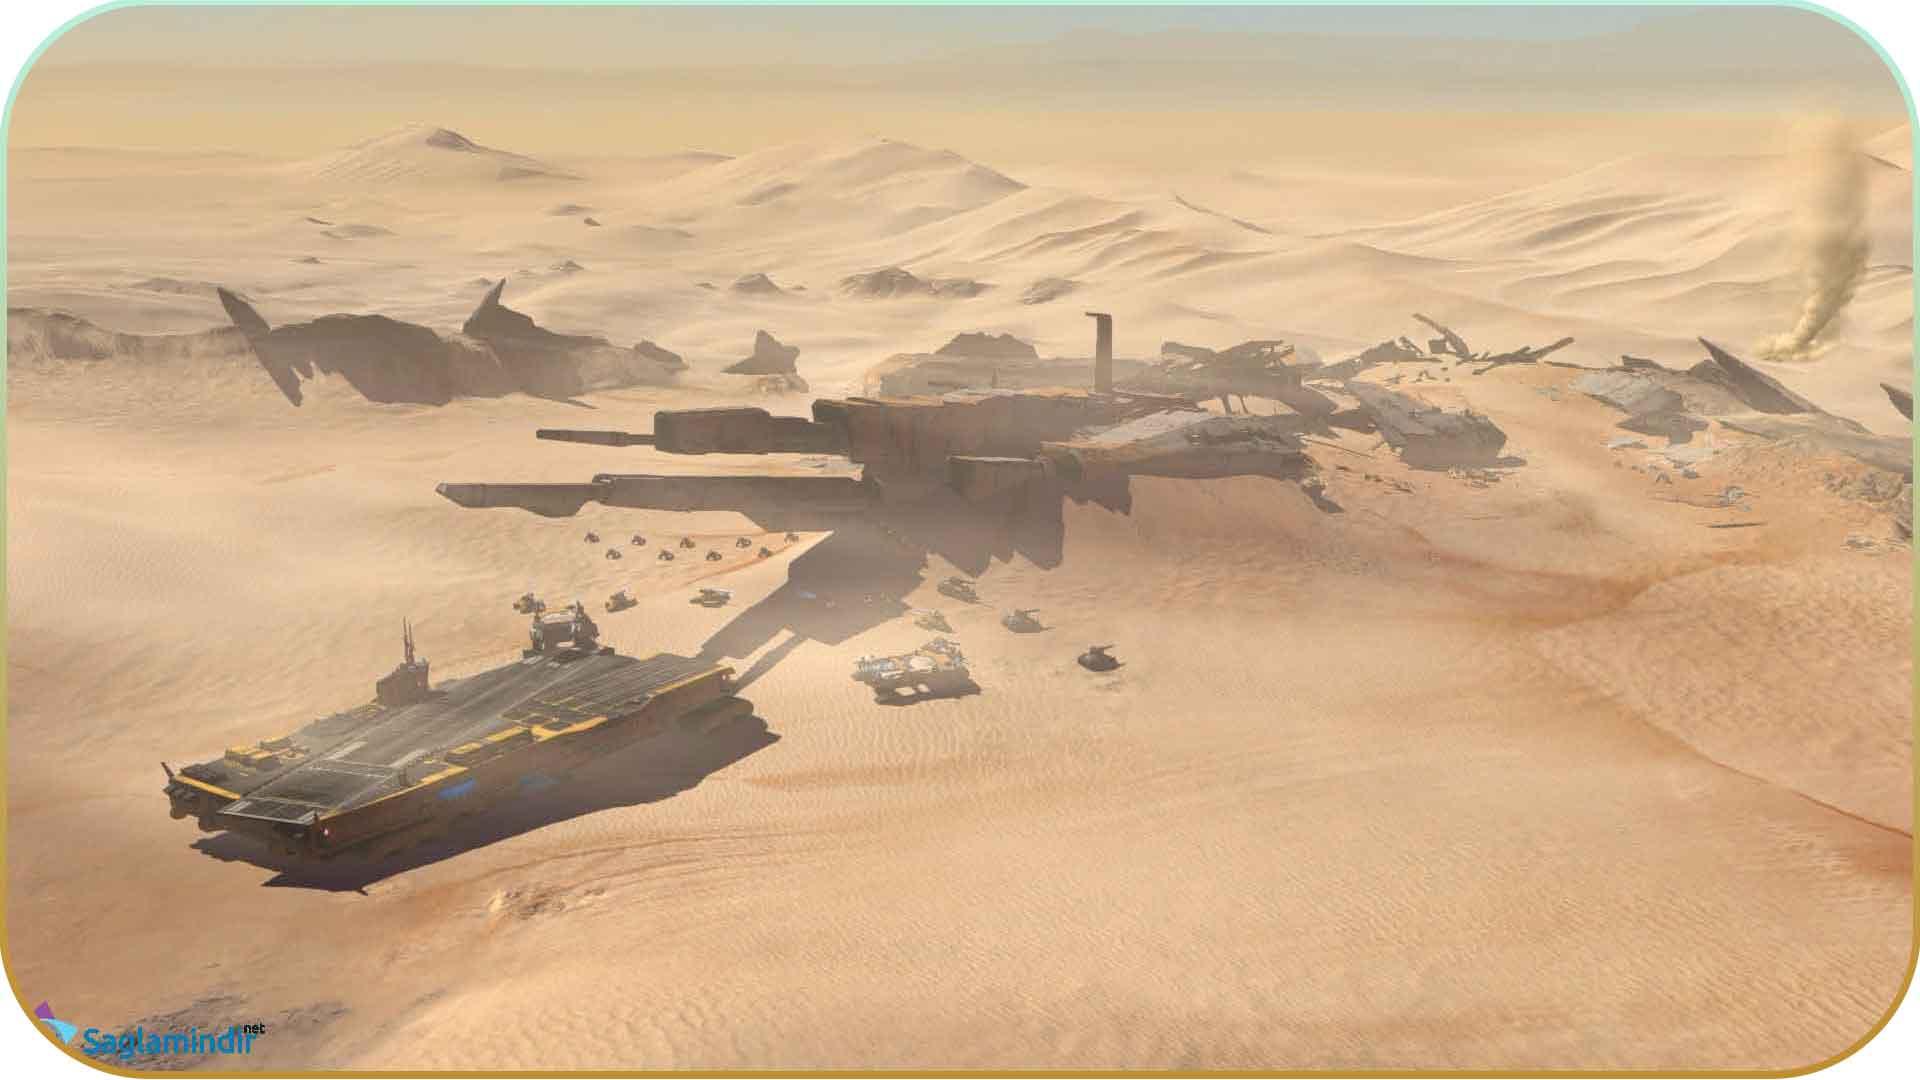 Homeworld Deserts Of Kharak saglamindir